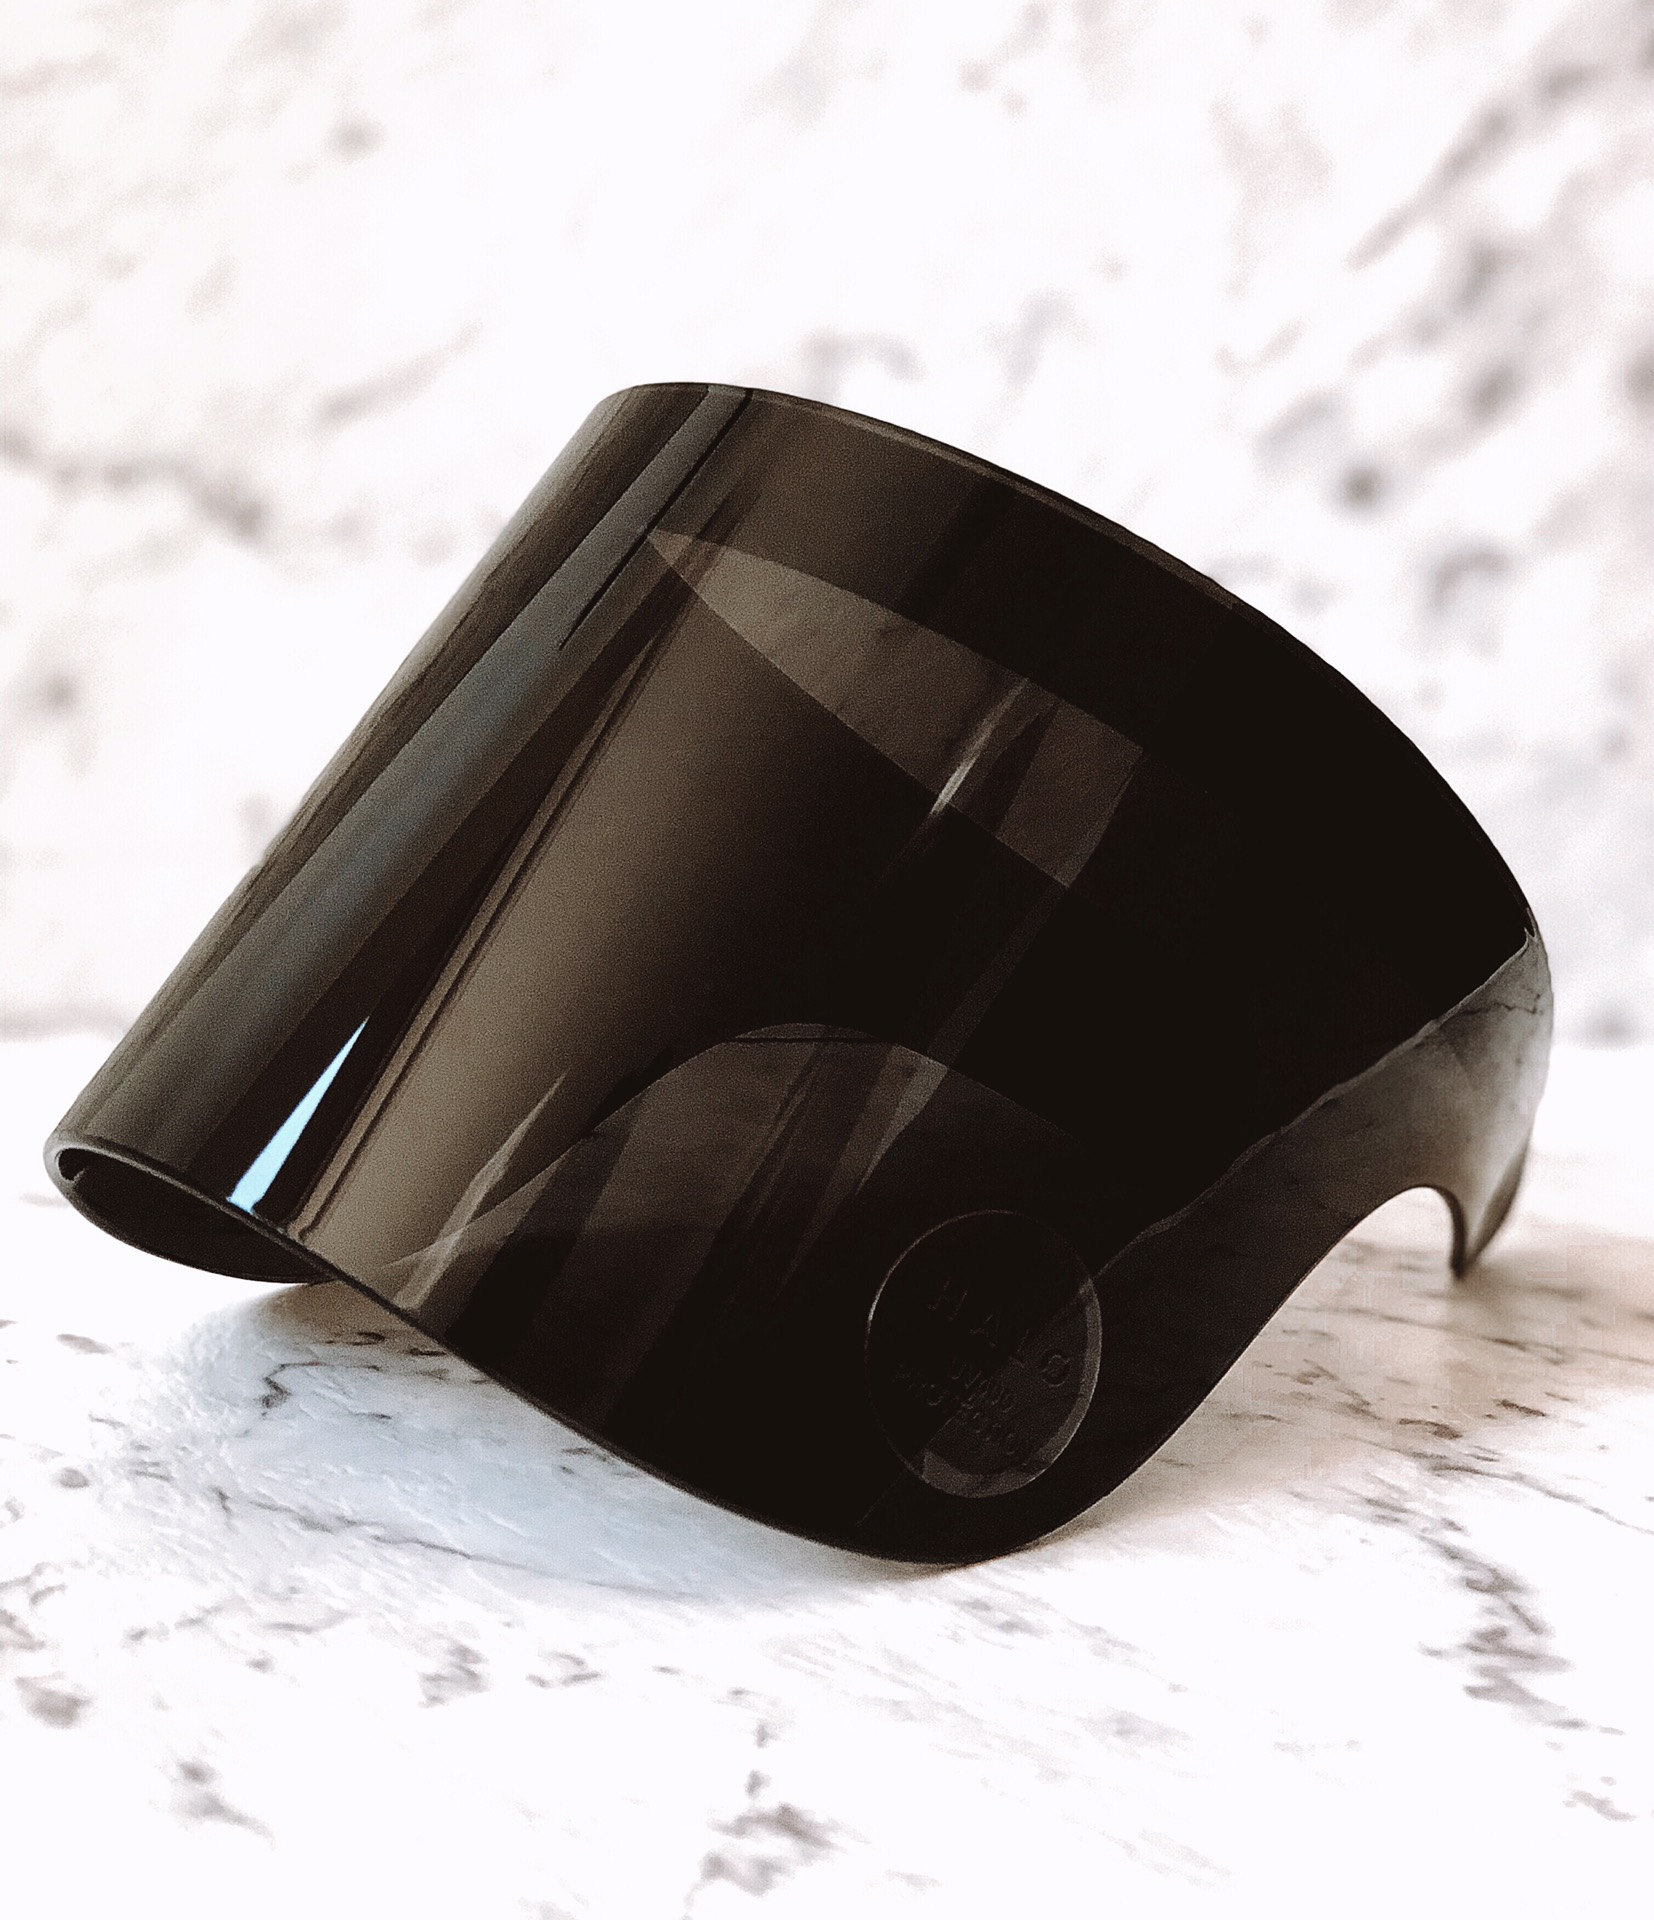 Product Spotlight – HALO by Dermal Hub – Sez Says